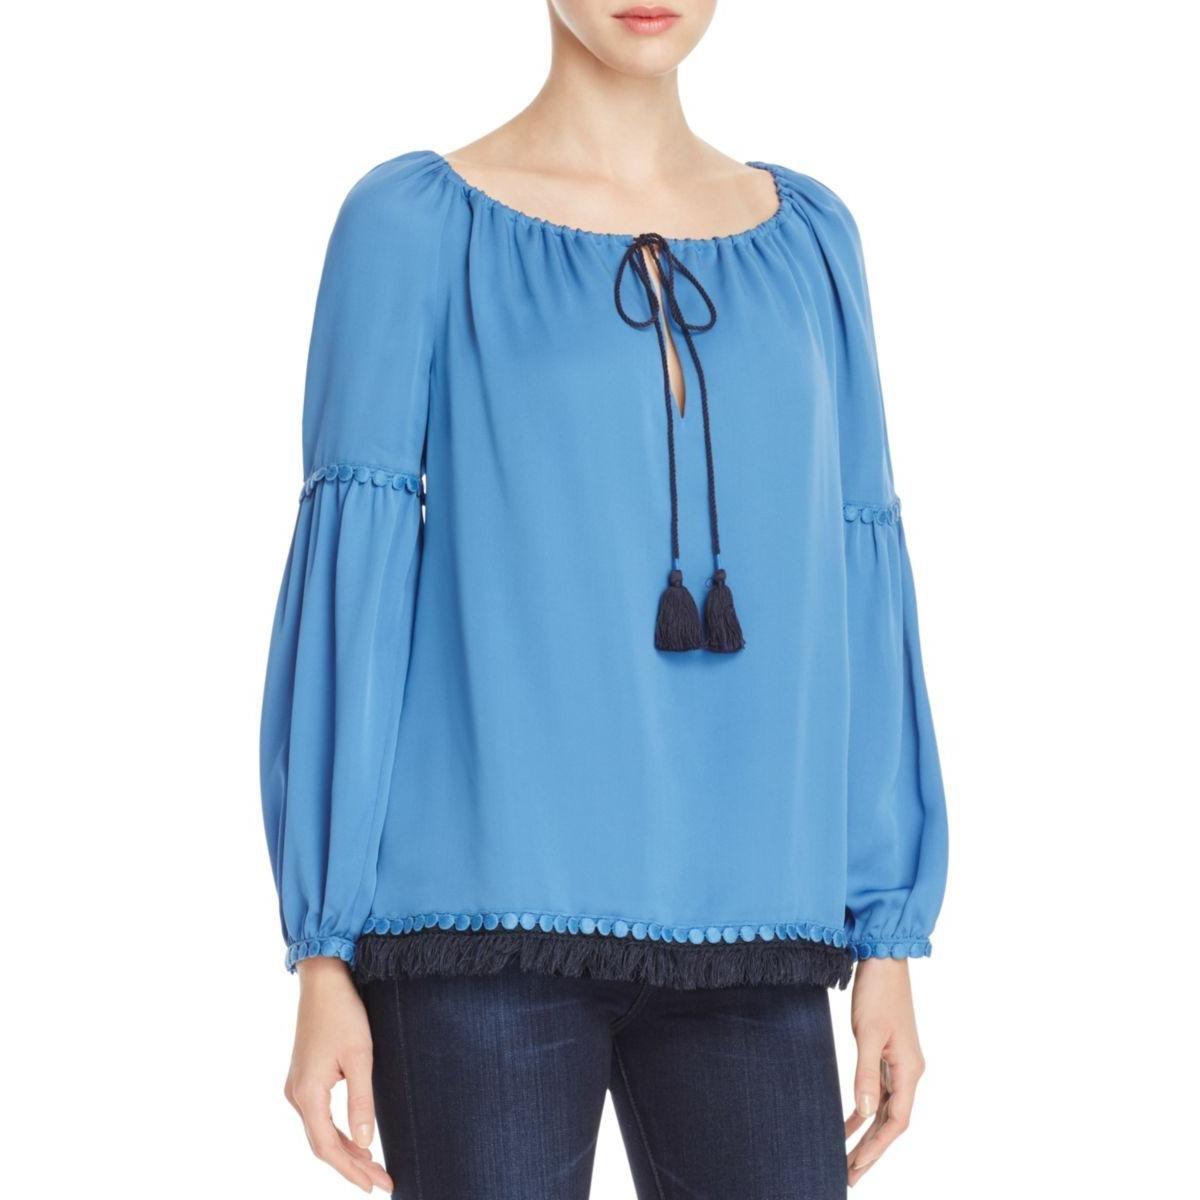 Tory Burch Womens Silk Fringe Tunic Top Blue 6